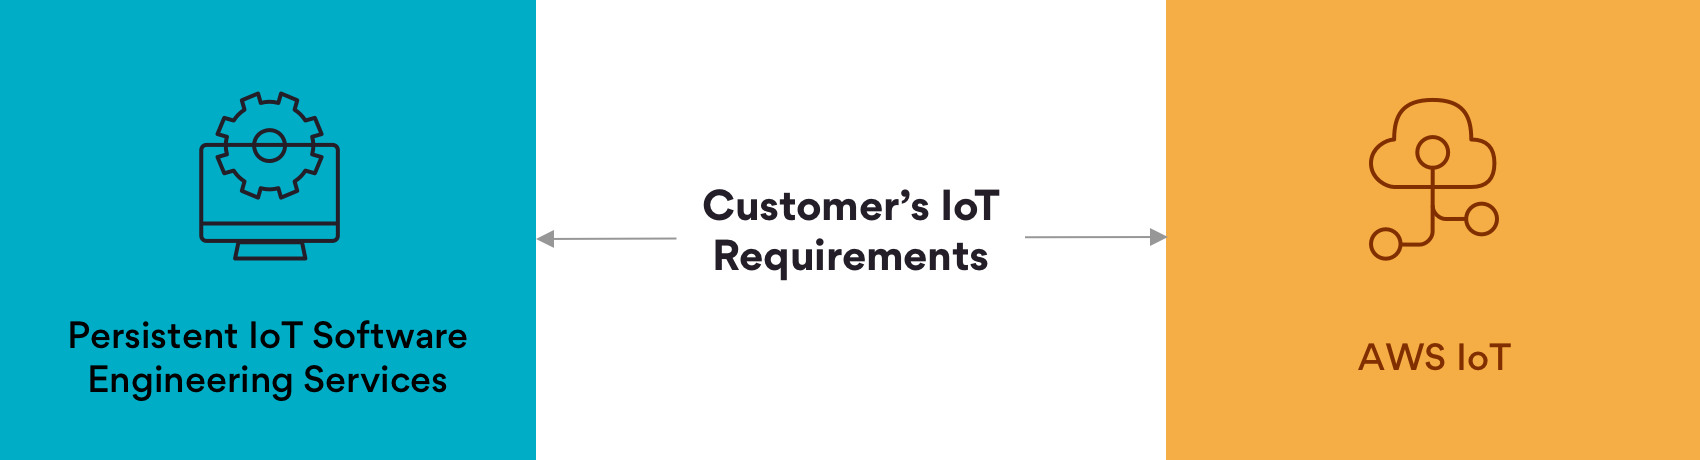 Infographic on Persistent IoT & Analytics Services